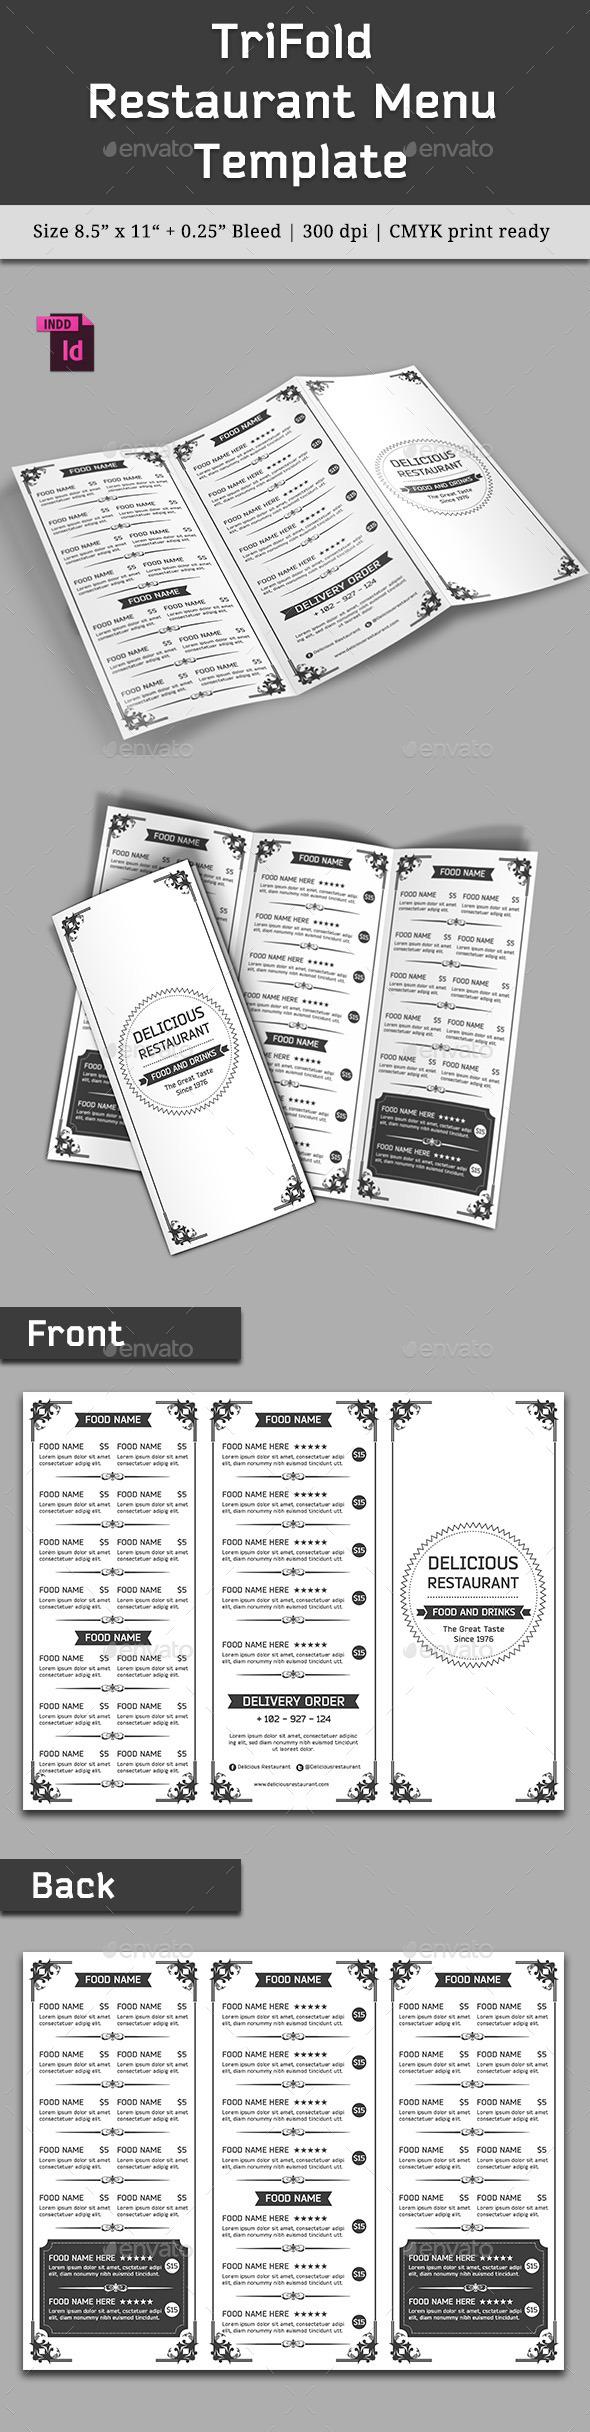 GraphicRiver TriFold Restaurant Menu Template Vol 7 10413688